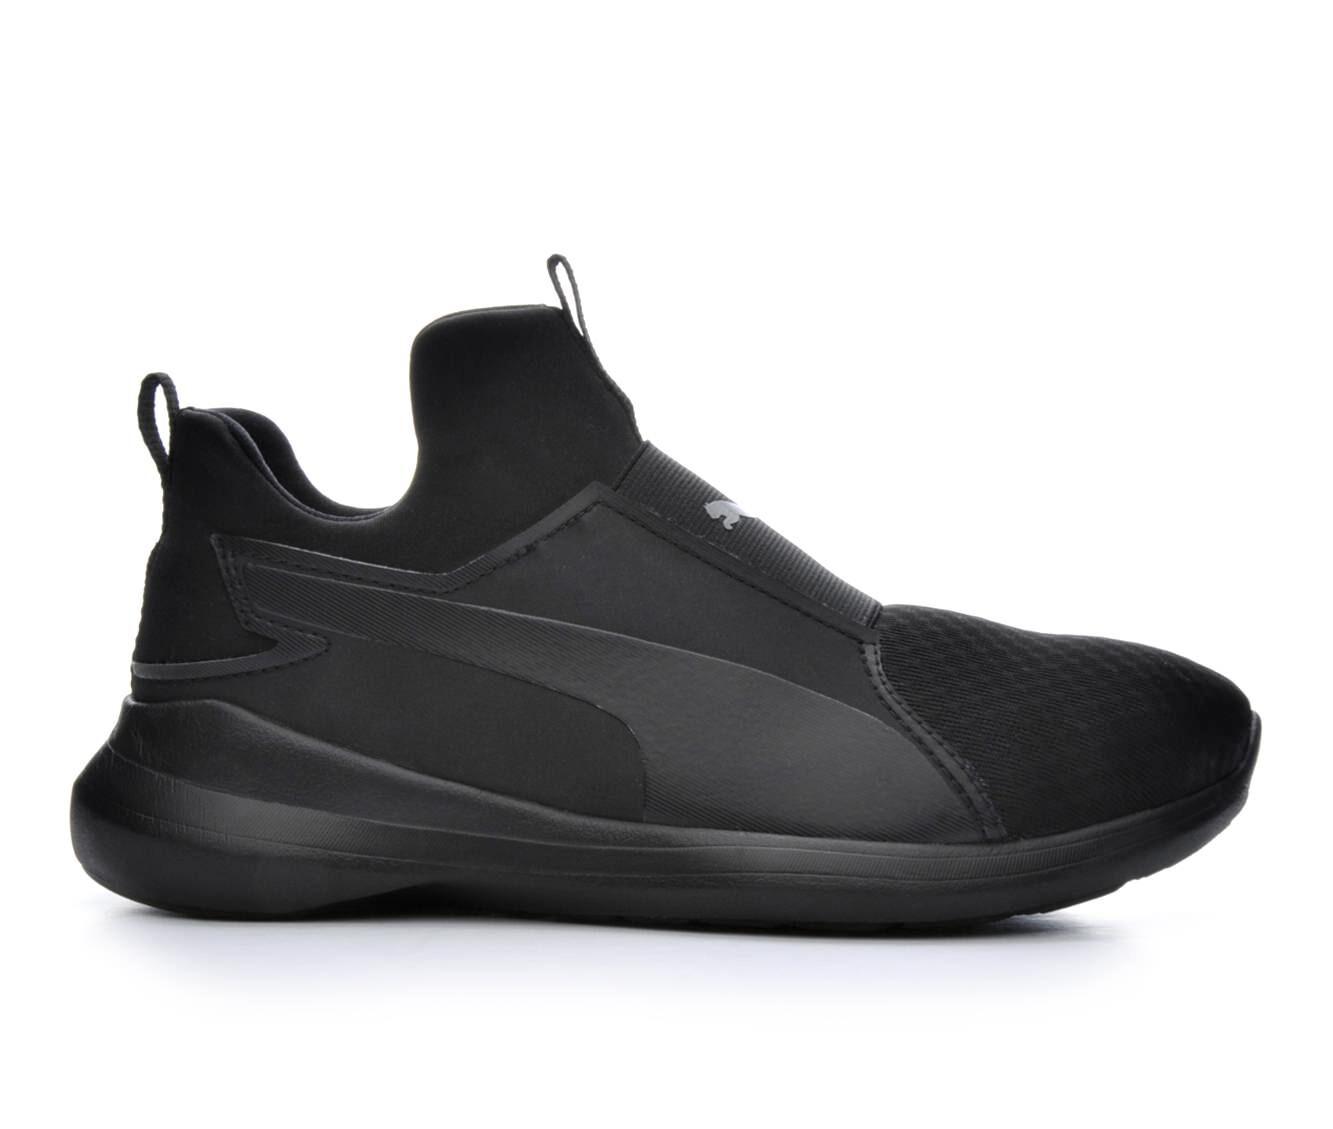 purchase export Women's Puma Rebel High Top Slip-On Sneakers Black/Black